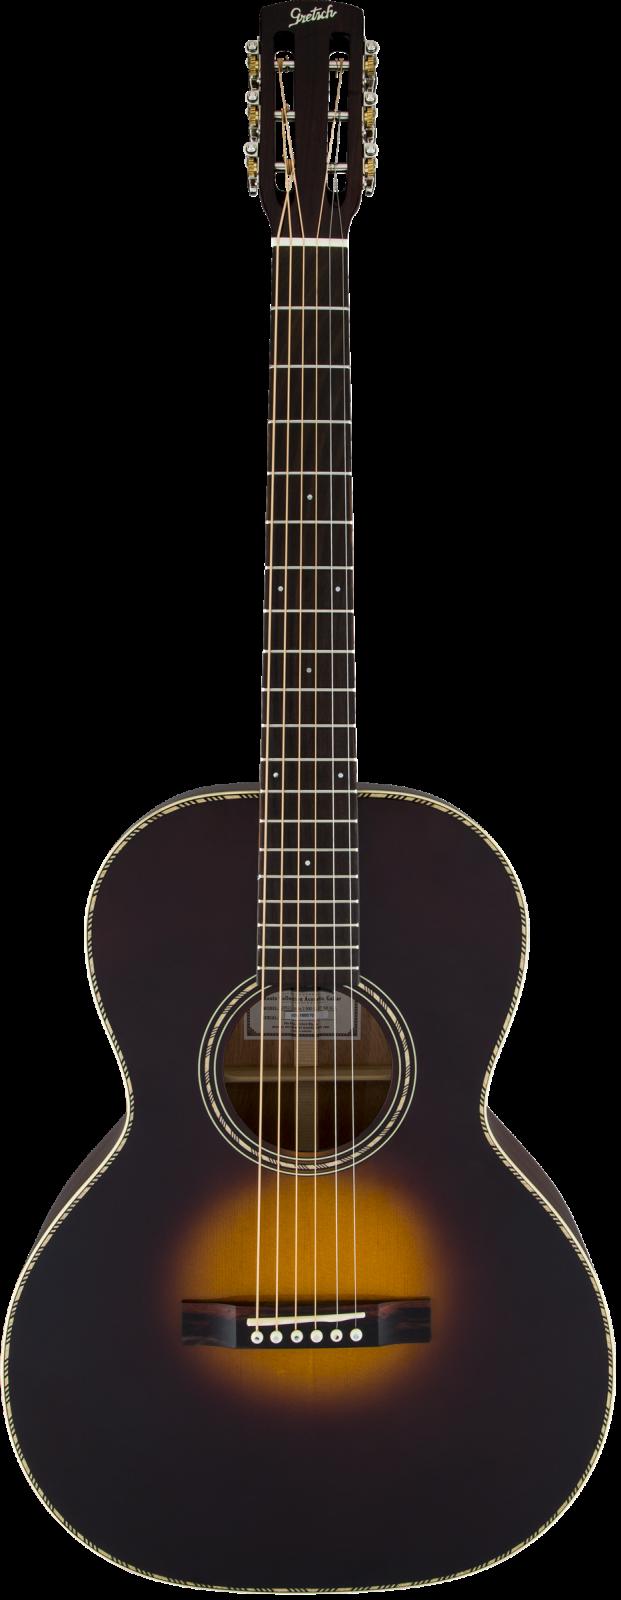 Gretsch G9521 Style 2 Triple-0 Auditorium Acoustic Guitar